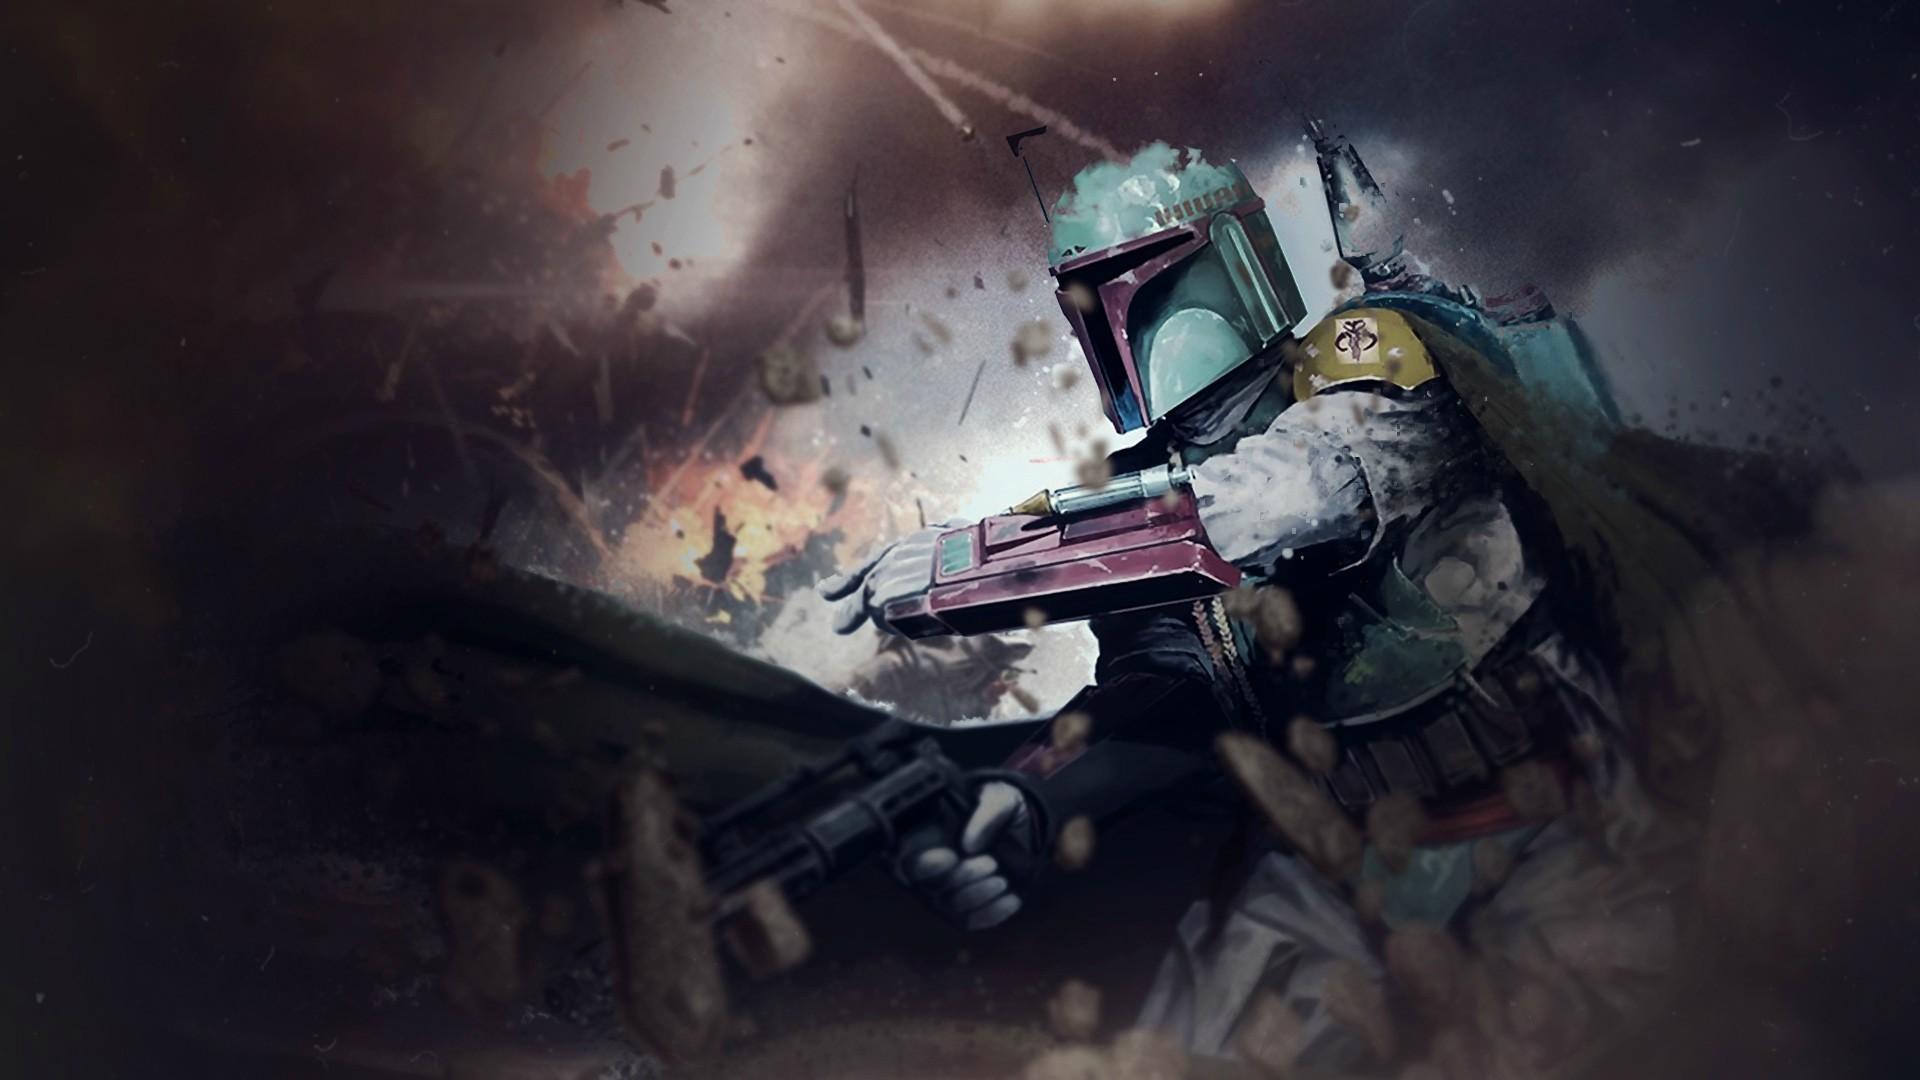 star wars desktop wallpaper 4k